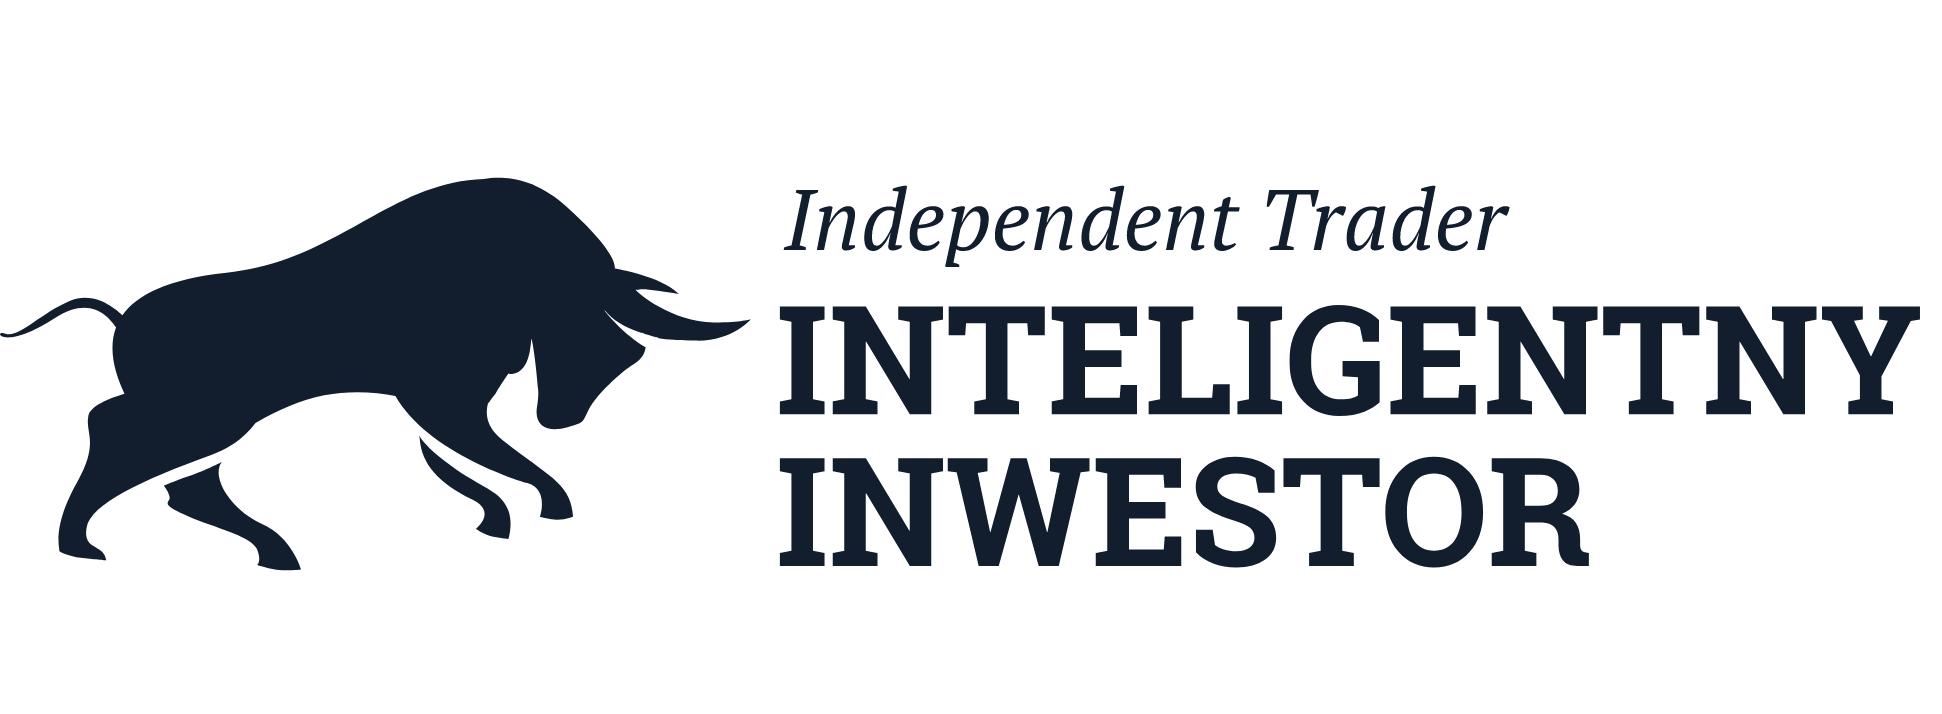 Inteligenty Inwestor